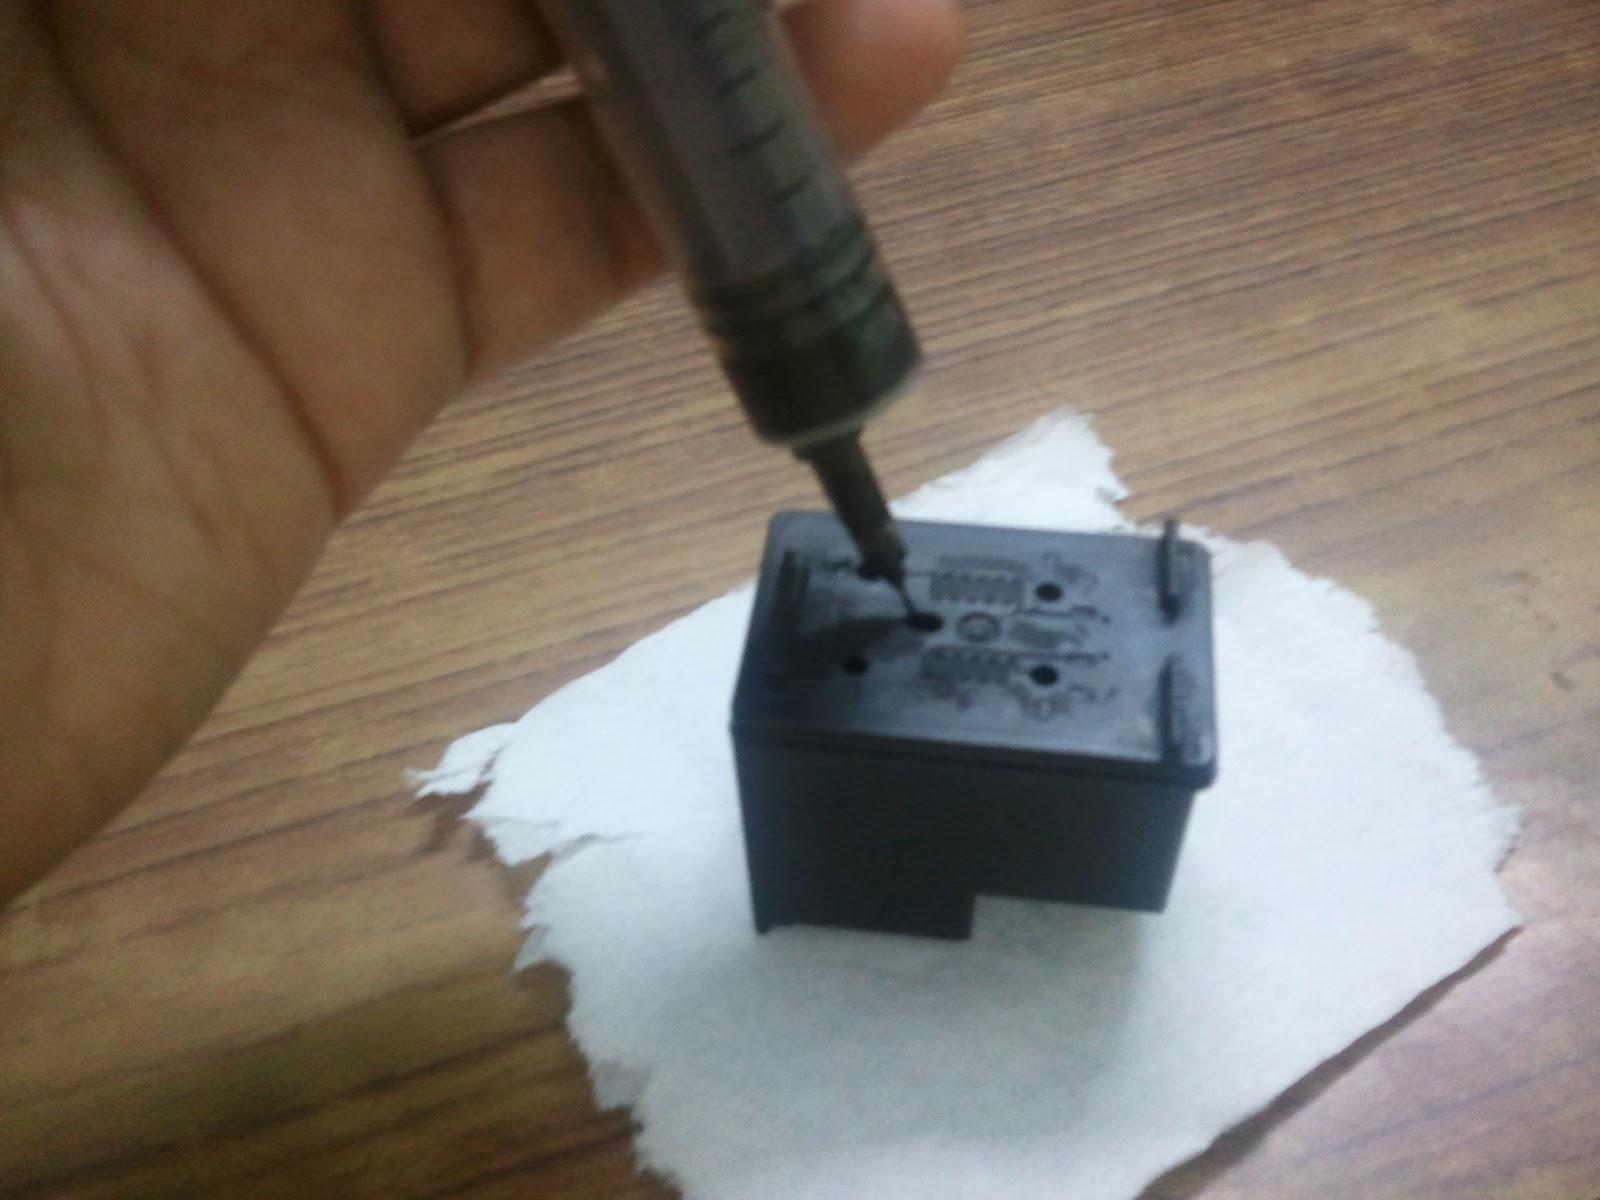 Harga Dan Spesifikasi Catridge Original Hp 802 Cl Small Update 2018 Otomobil Head Lamp Kanan Su Iz 20 C949 05 6b Isuzu D Max V Cross 2011 2012 Lights Refill Cartridge